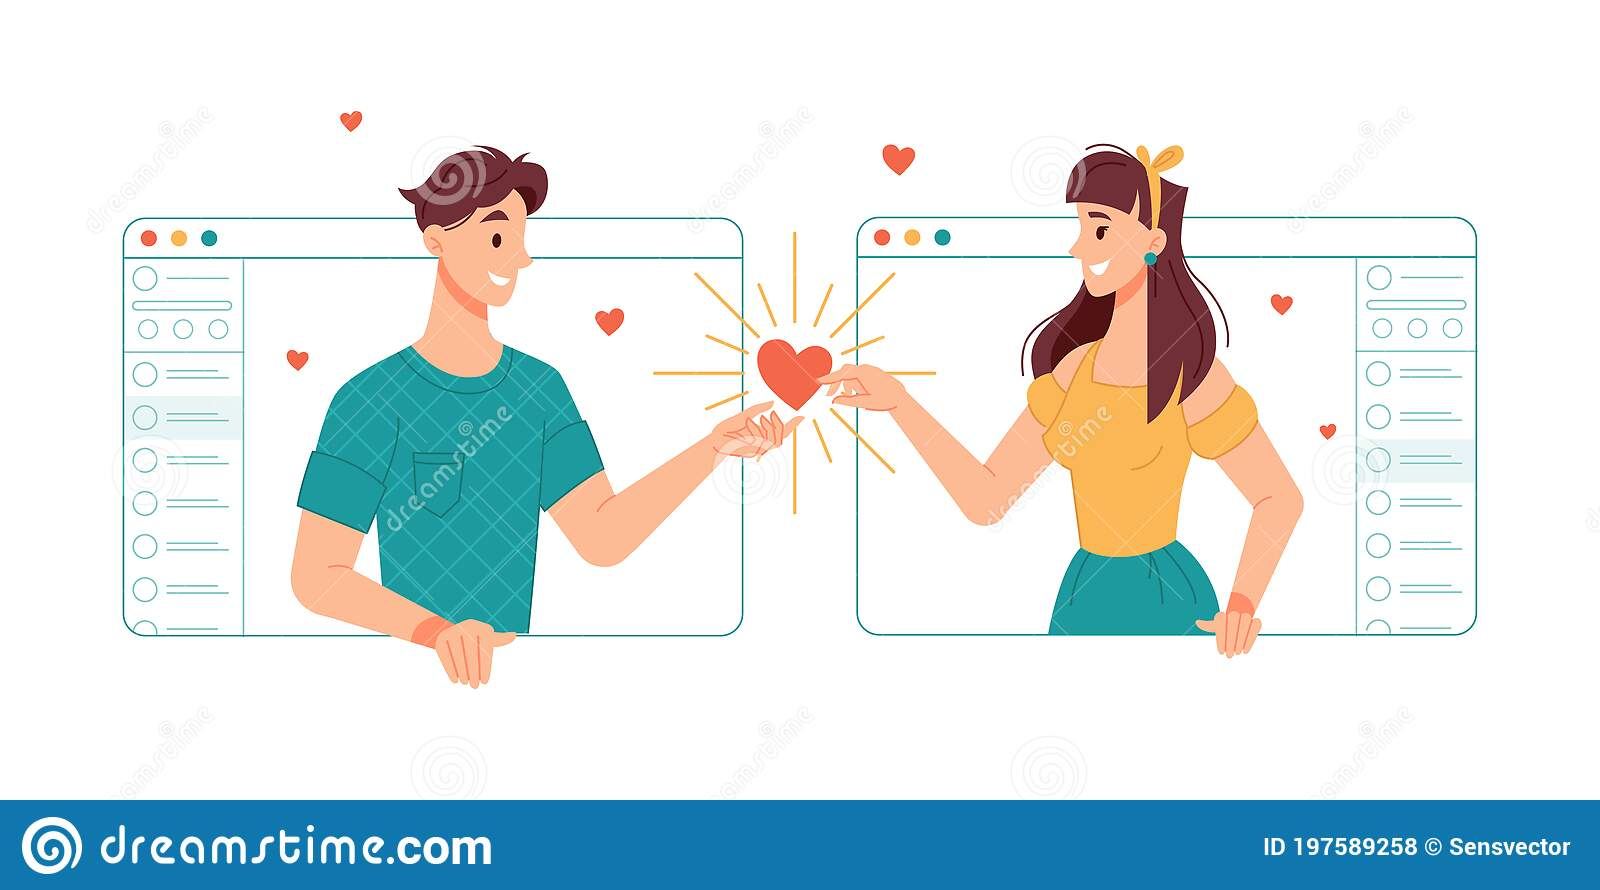 dating on- line ar trebui să o fac